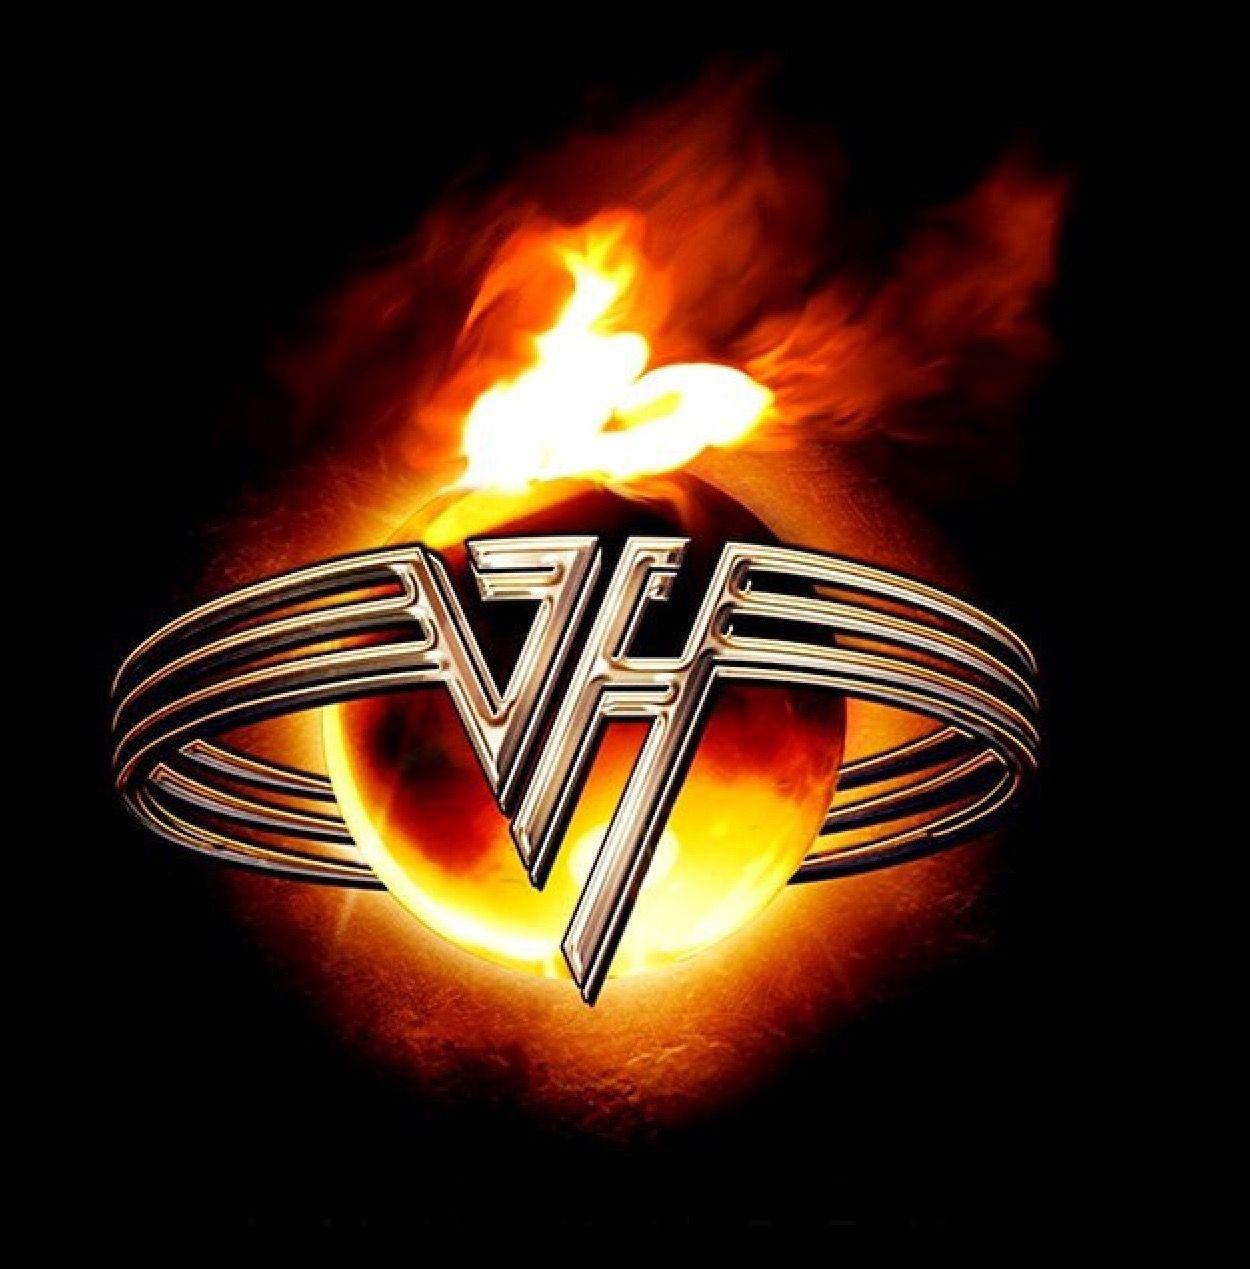 Pin By Rodrigo Molina On Eddie Van Halen Rock Band Logos Van Halen Van Halen Logo